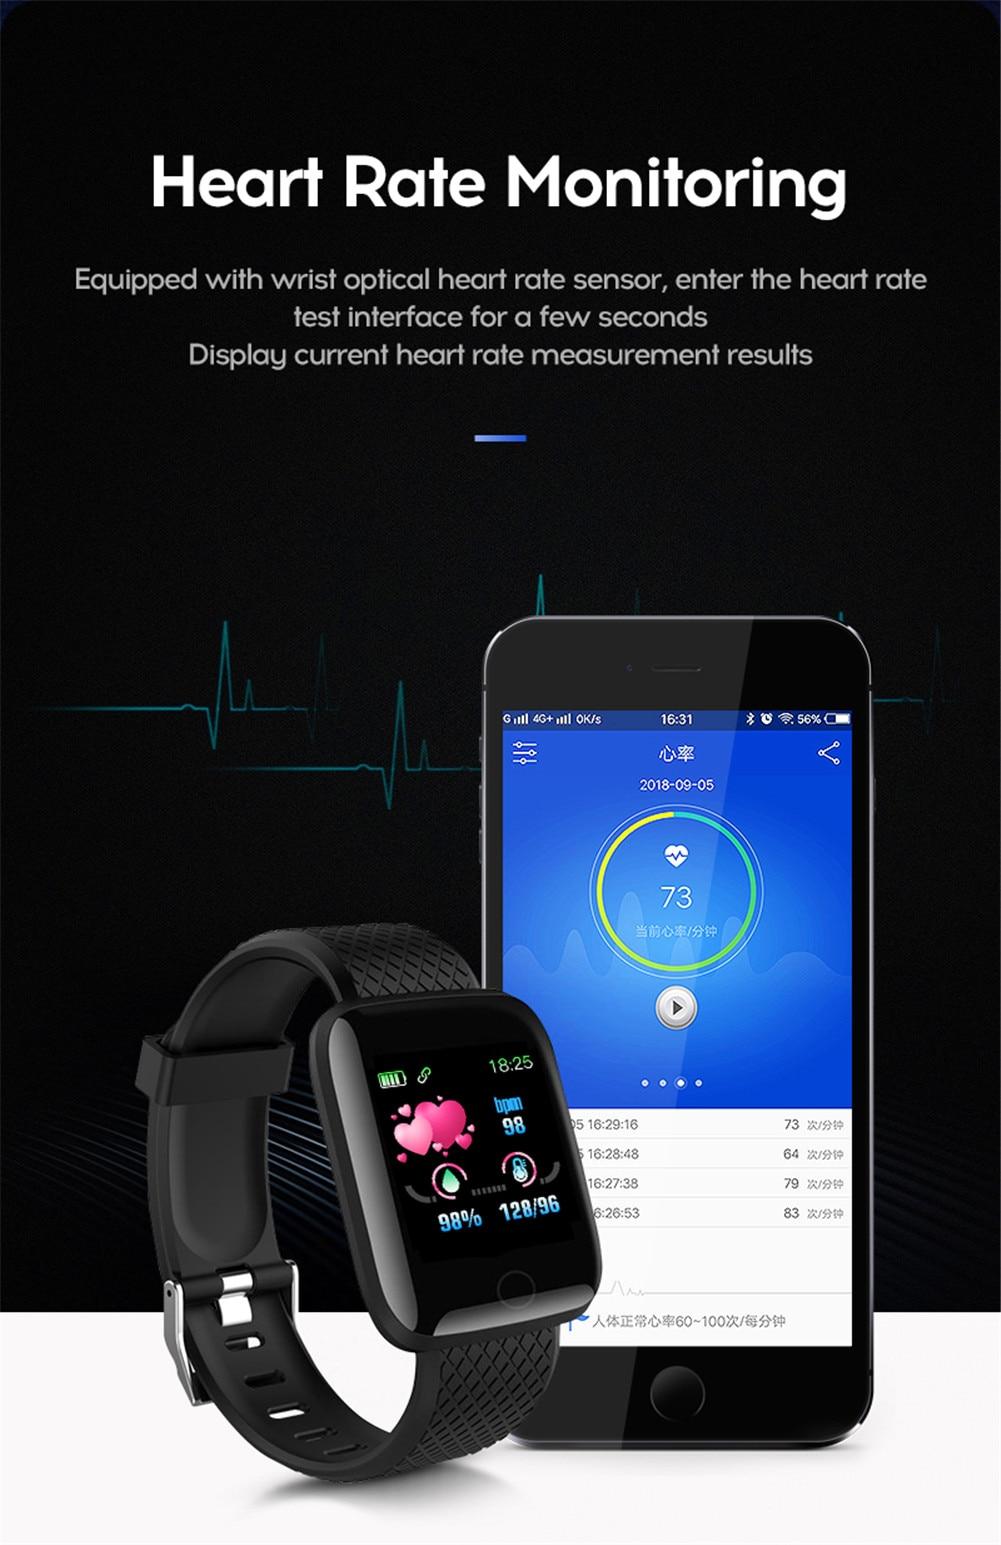 Heb68c46aacdd41629de3e6b2276c2afbi Smart Band Blood Pressure 1.14'' Screen Fitness Tracker Watch Heart Rate Fitness Bracelet Waterproof Music Control For Men Women